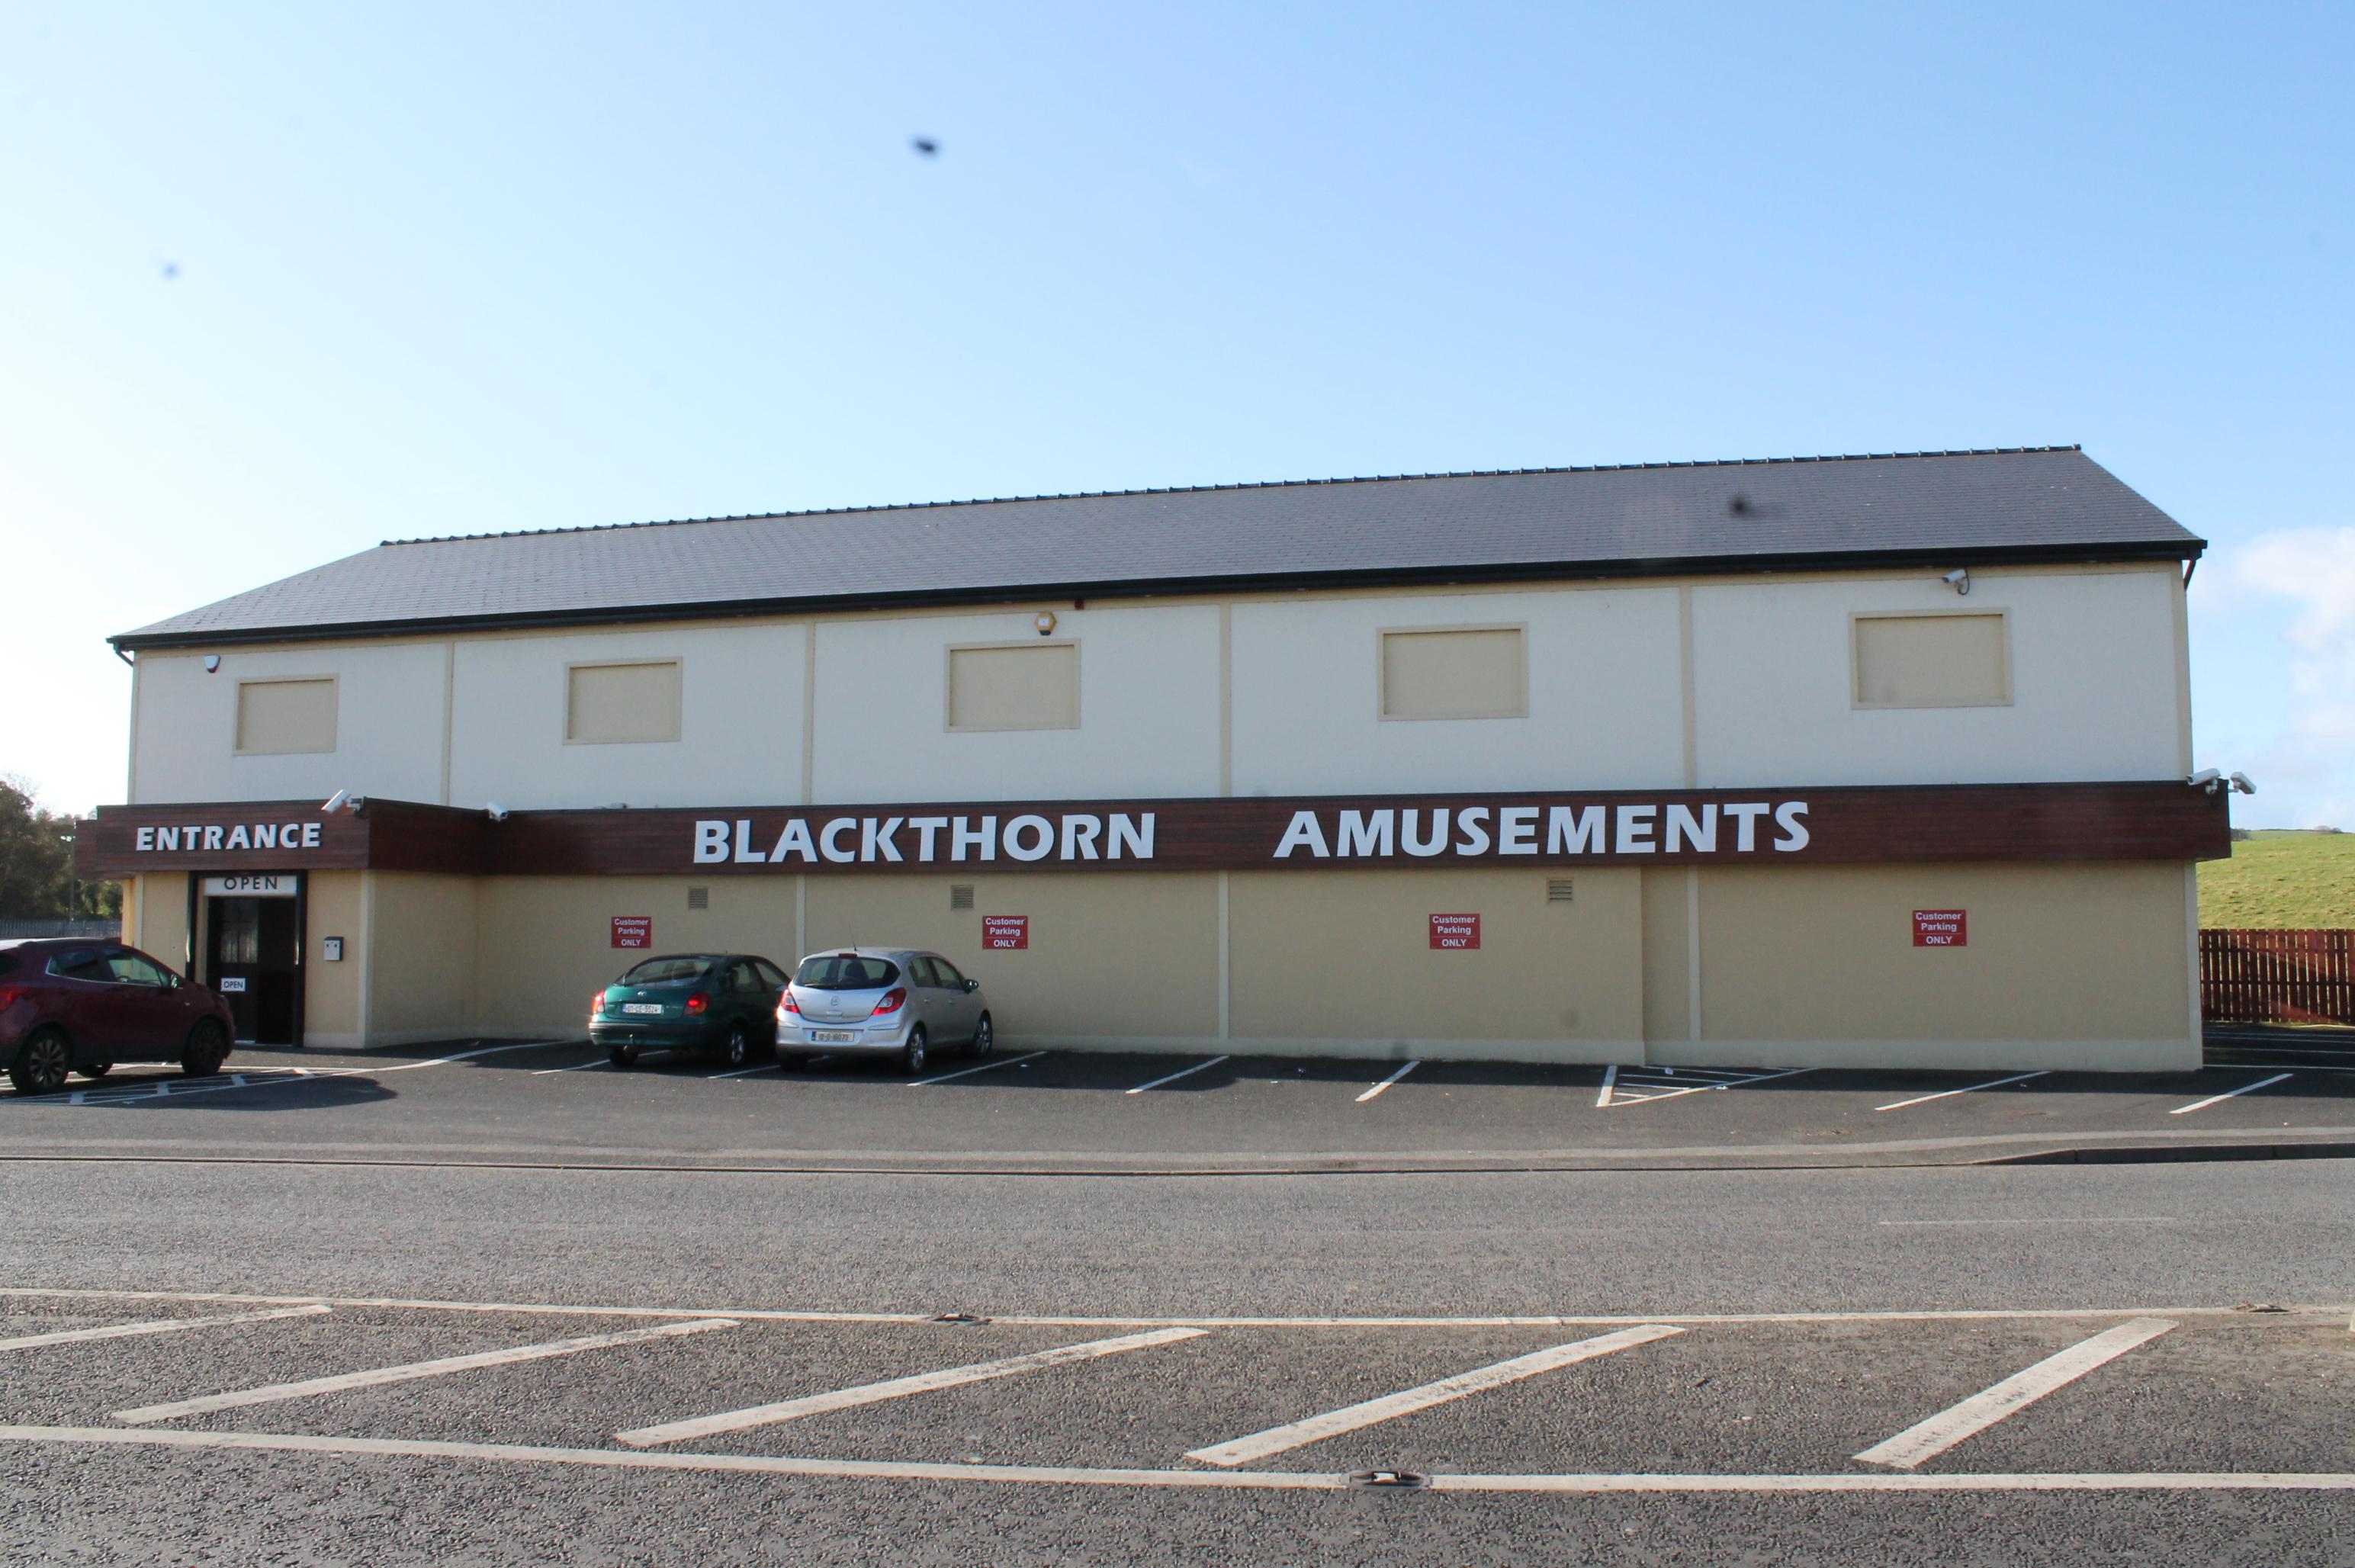 The Blackthorn Casino